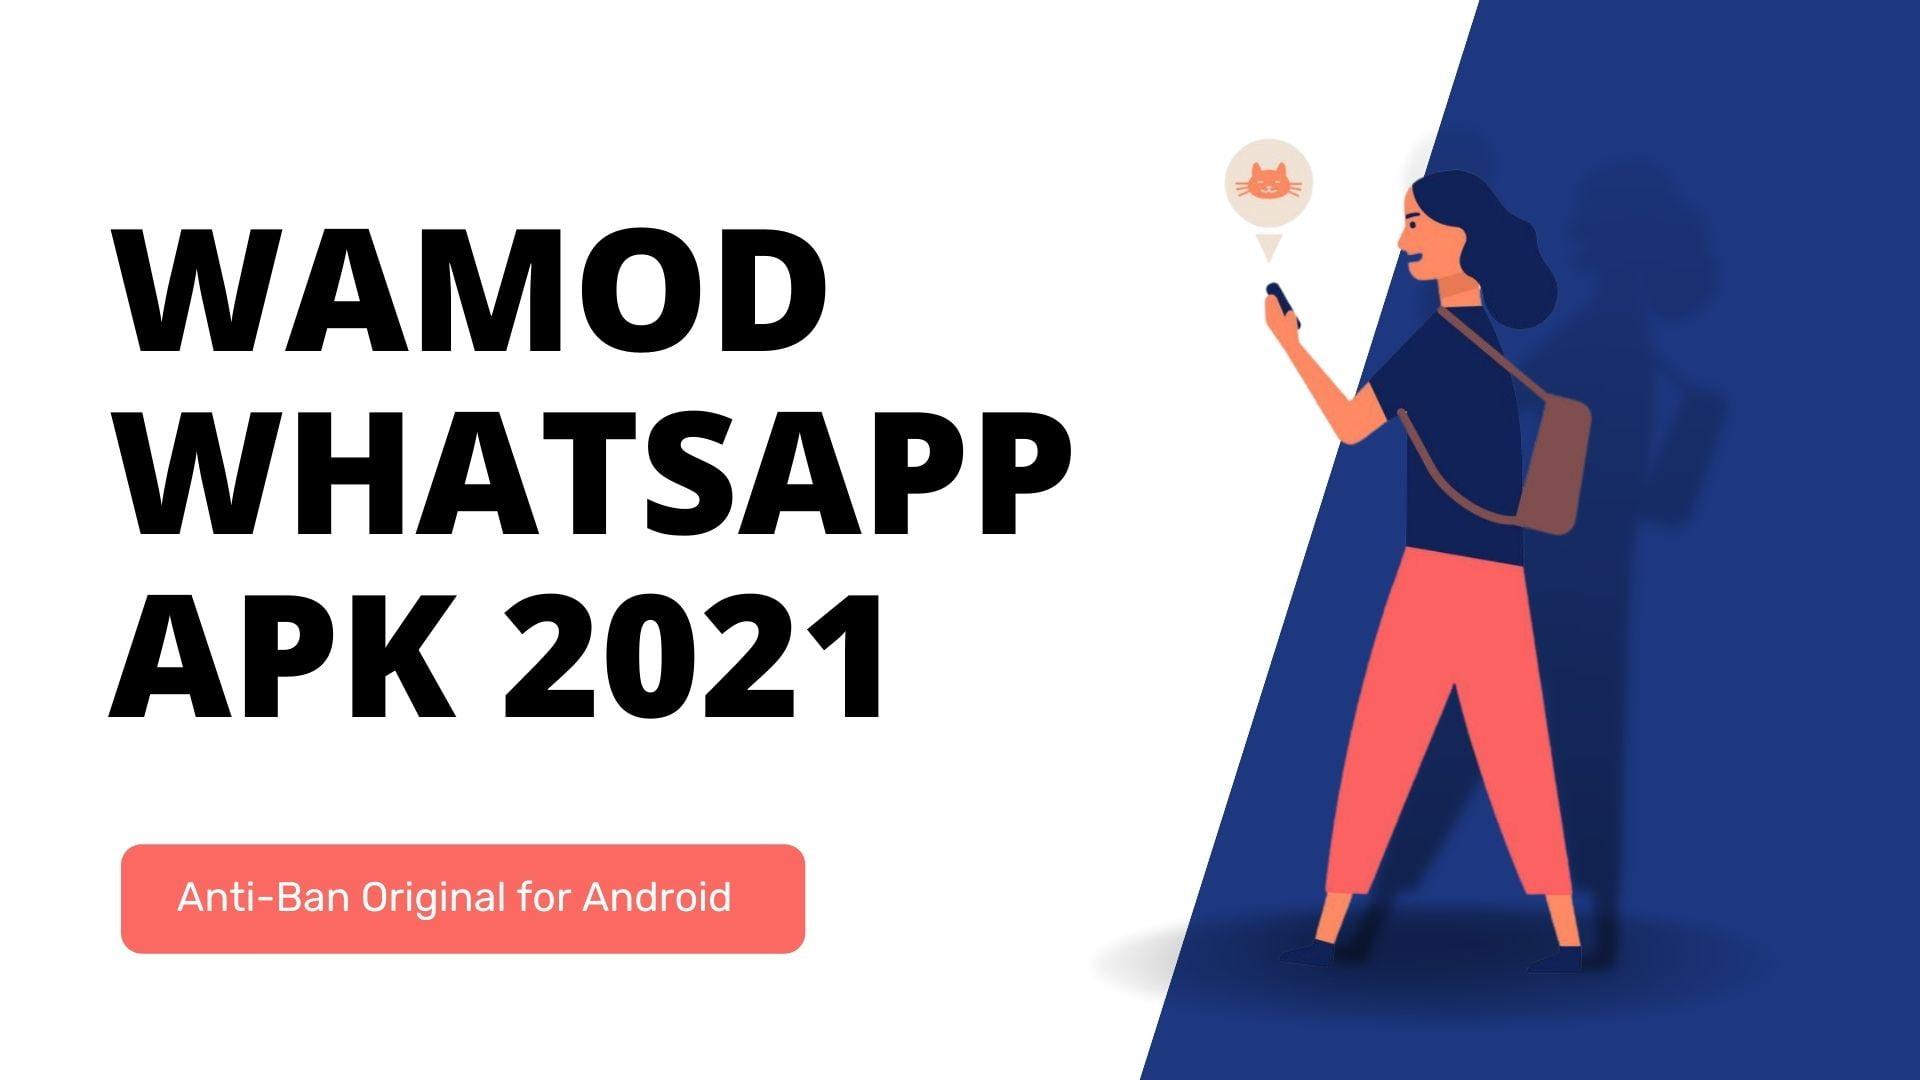 WAMOD WhatsApp APK 2021